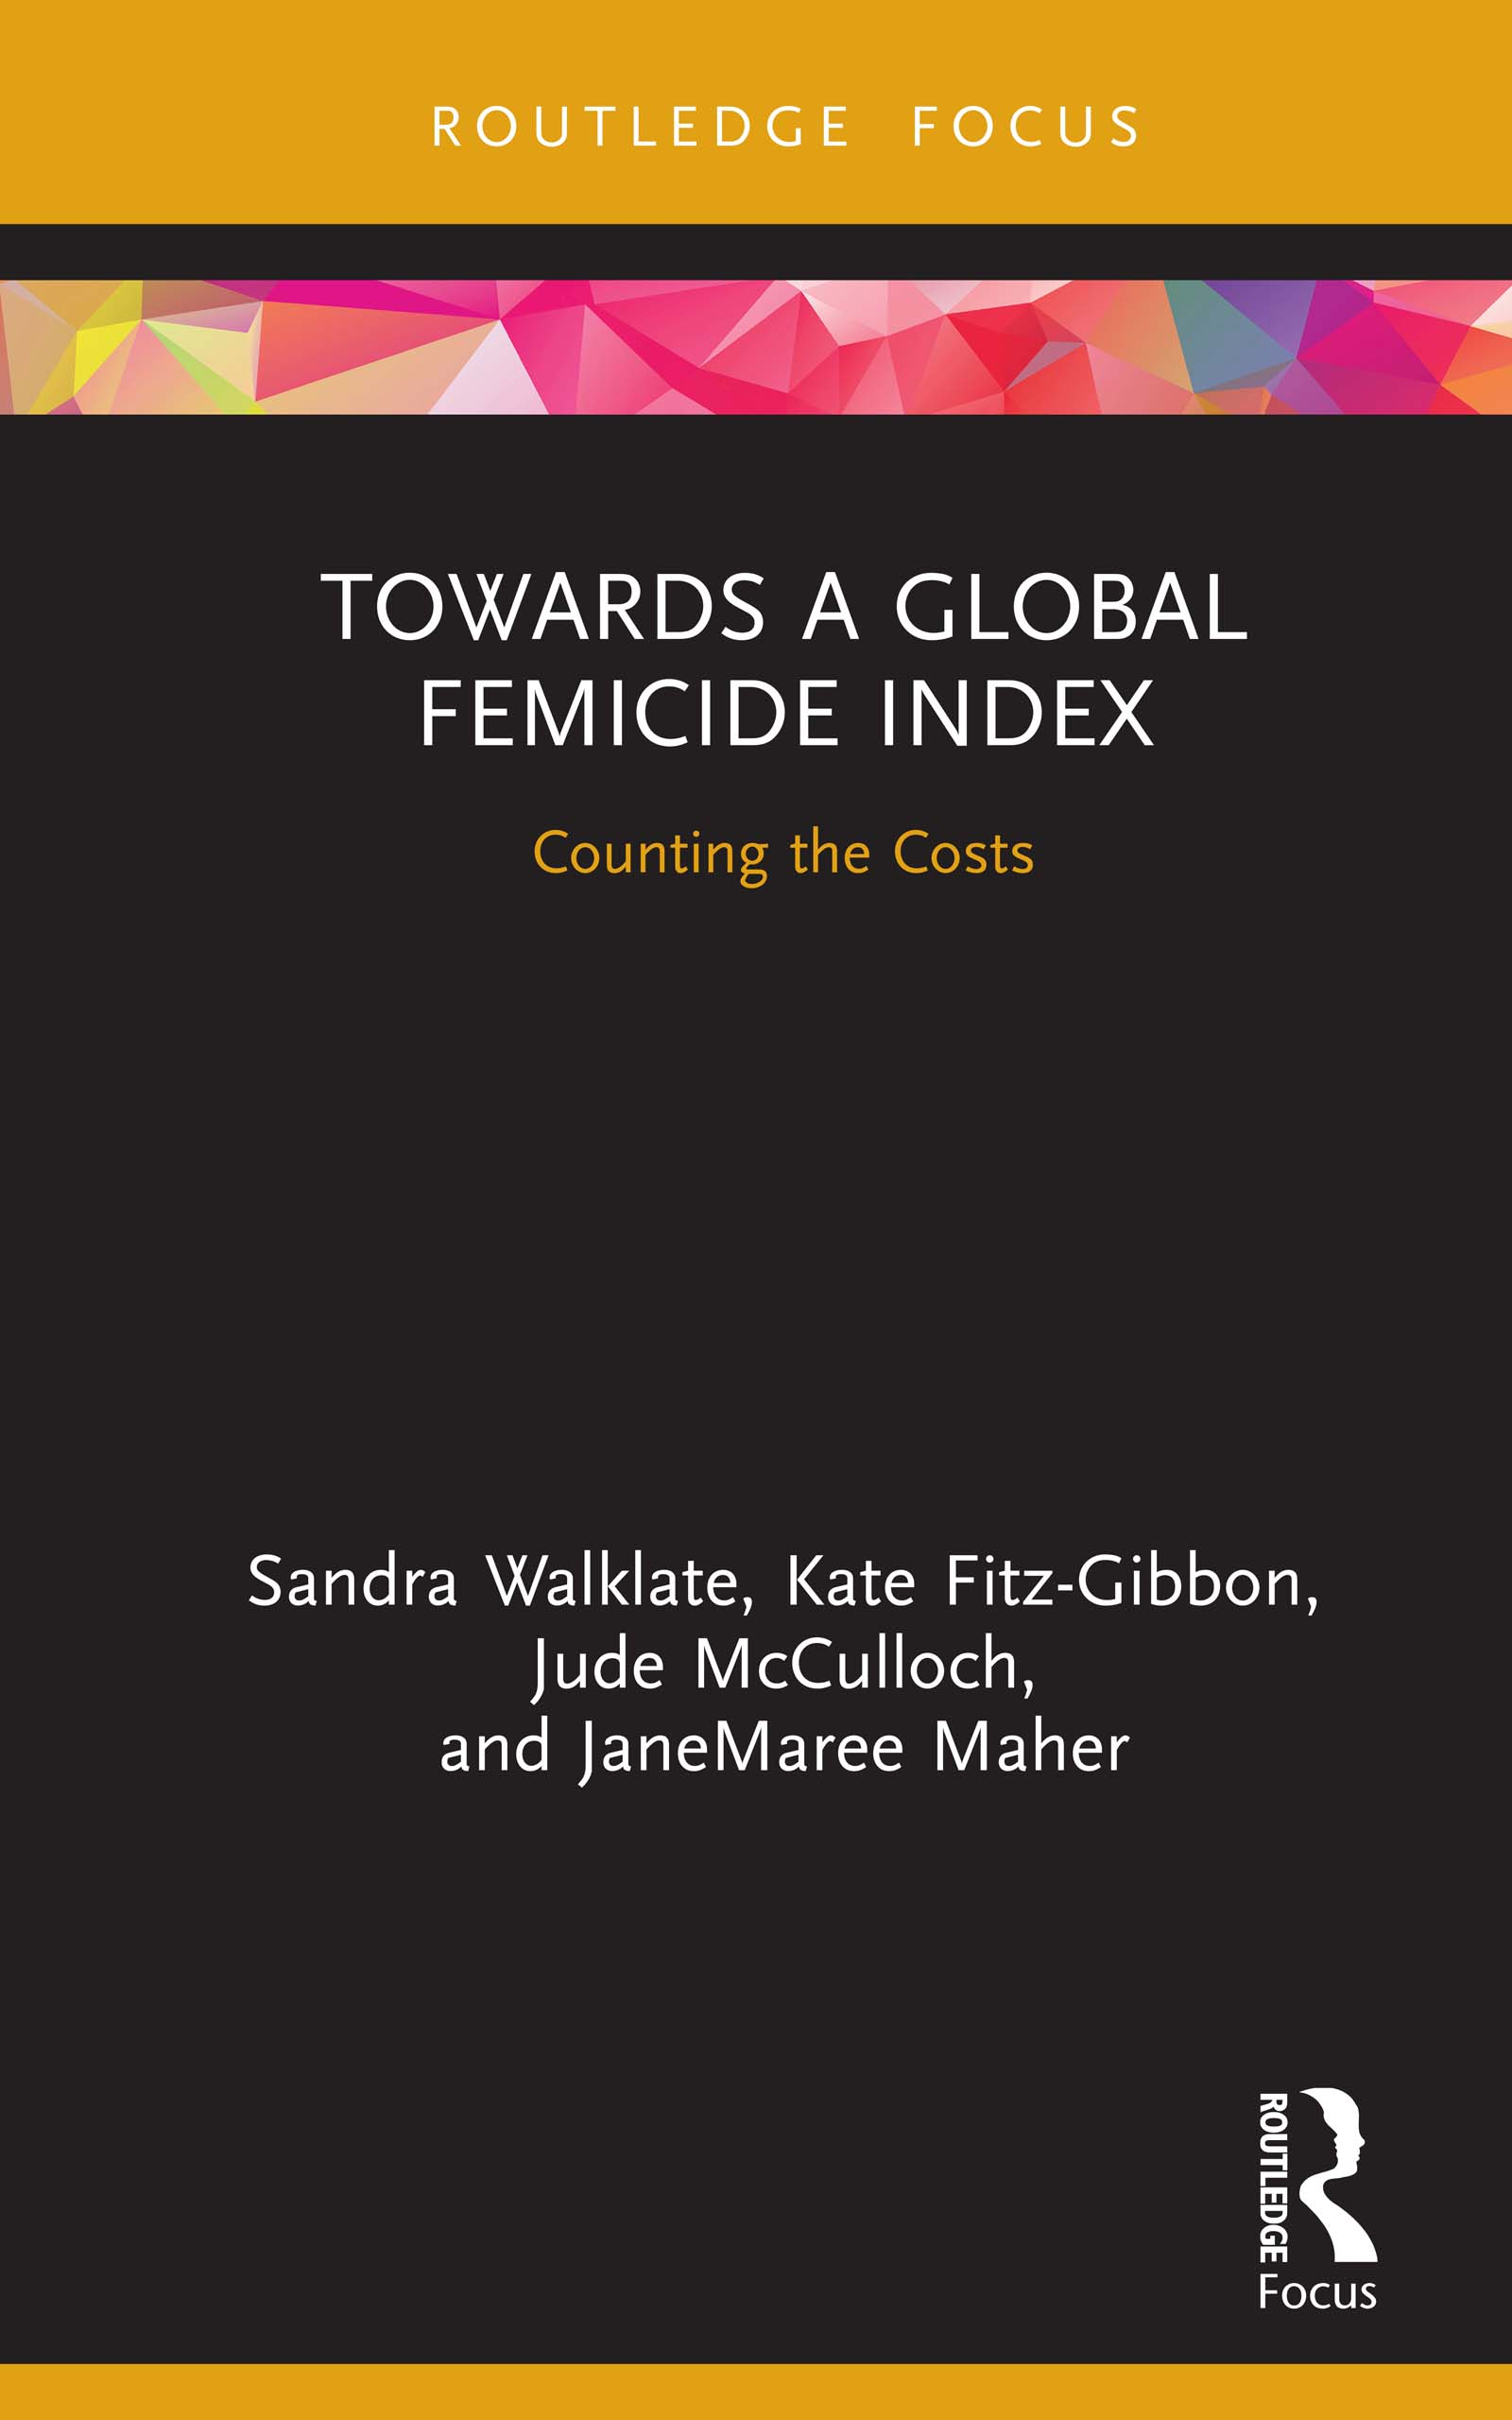 Towards a Global Femicide Index